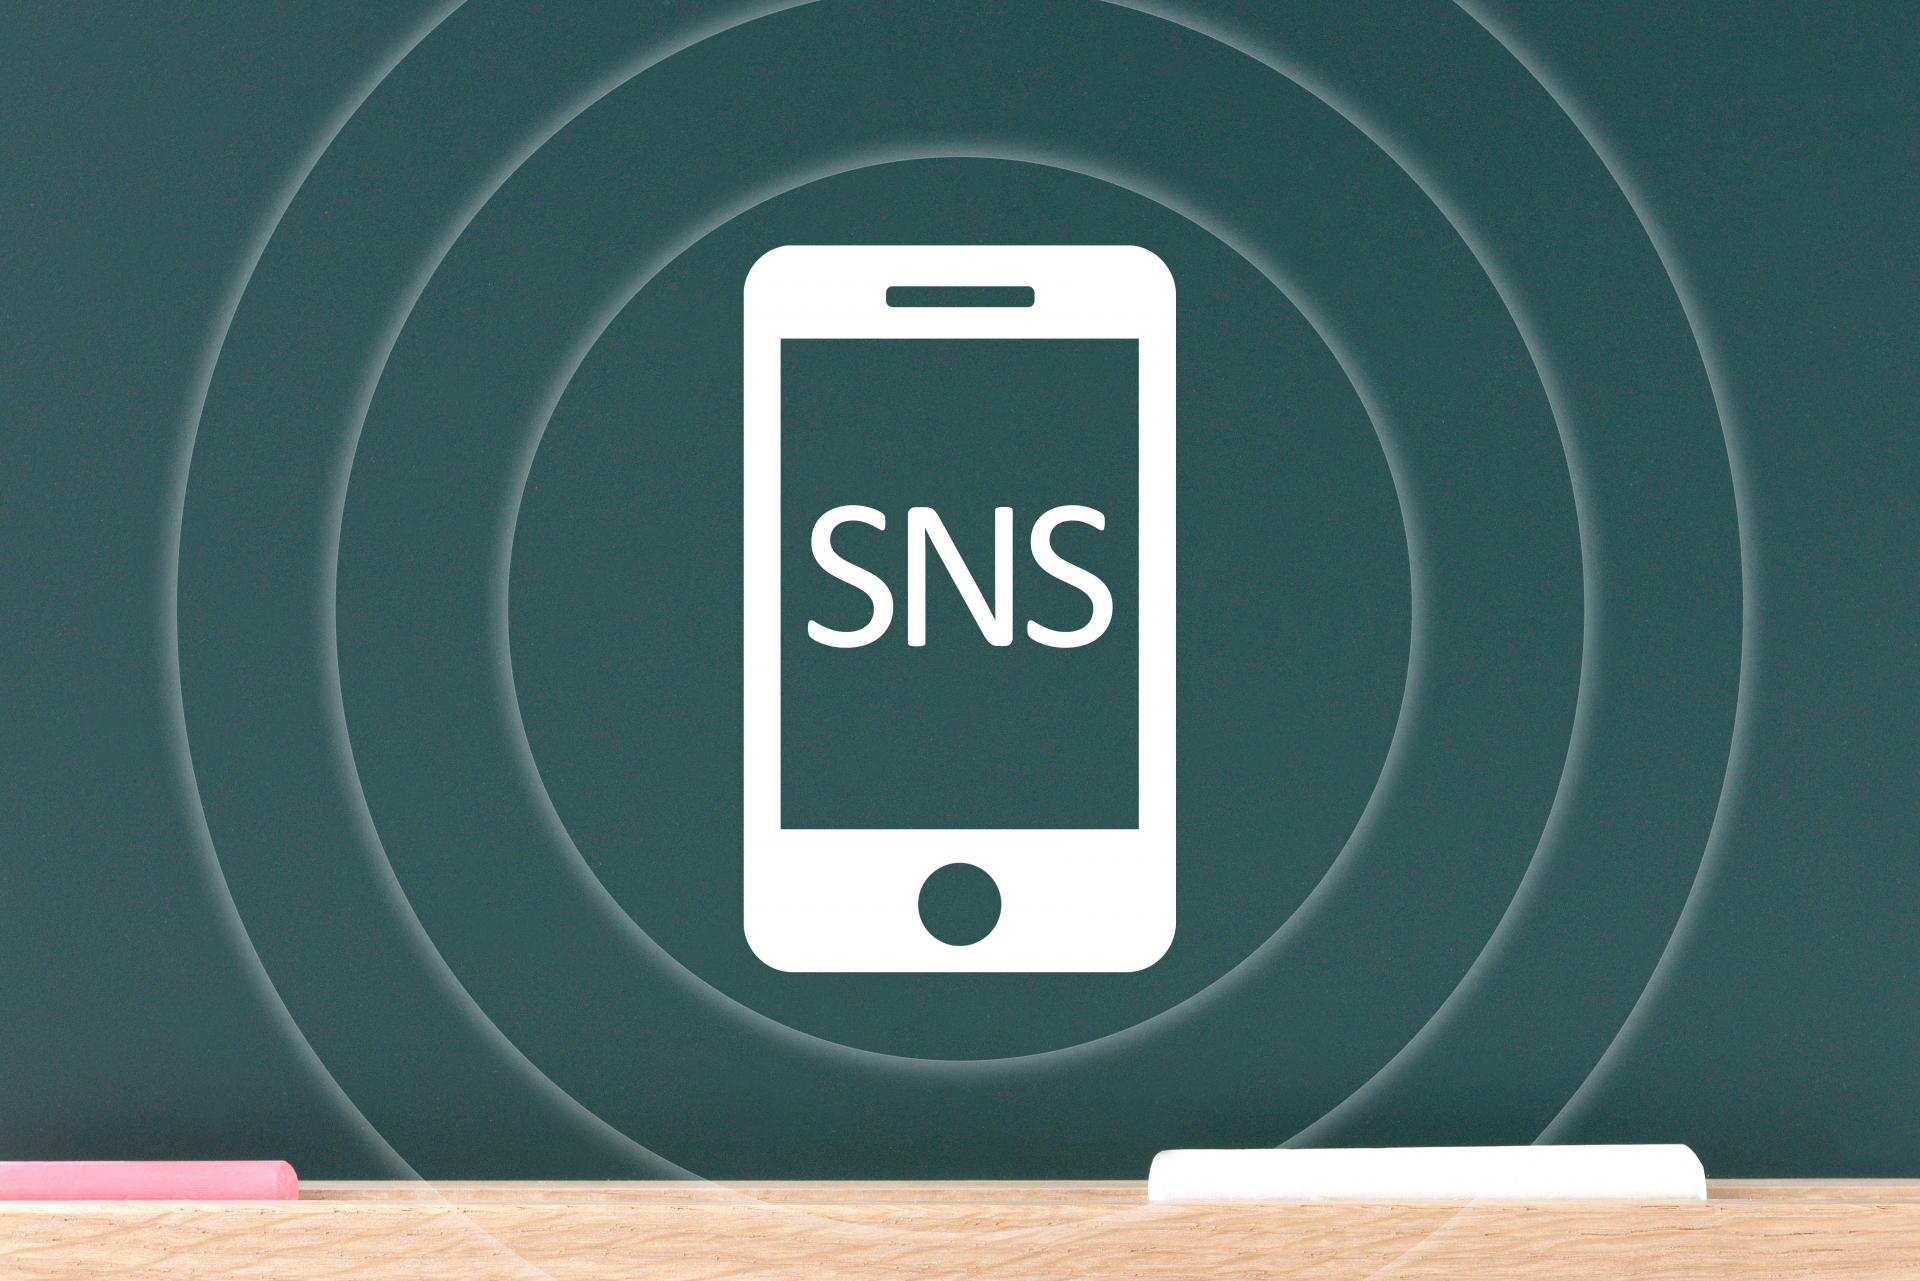 SNS広告のメリット・デメリット(LPO Web広告編)